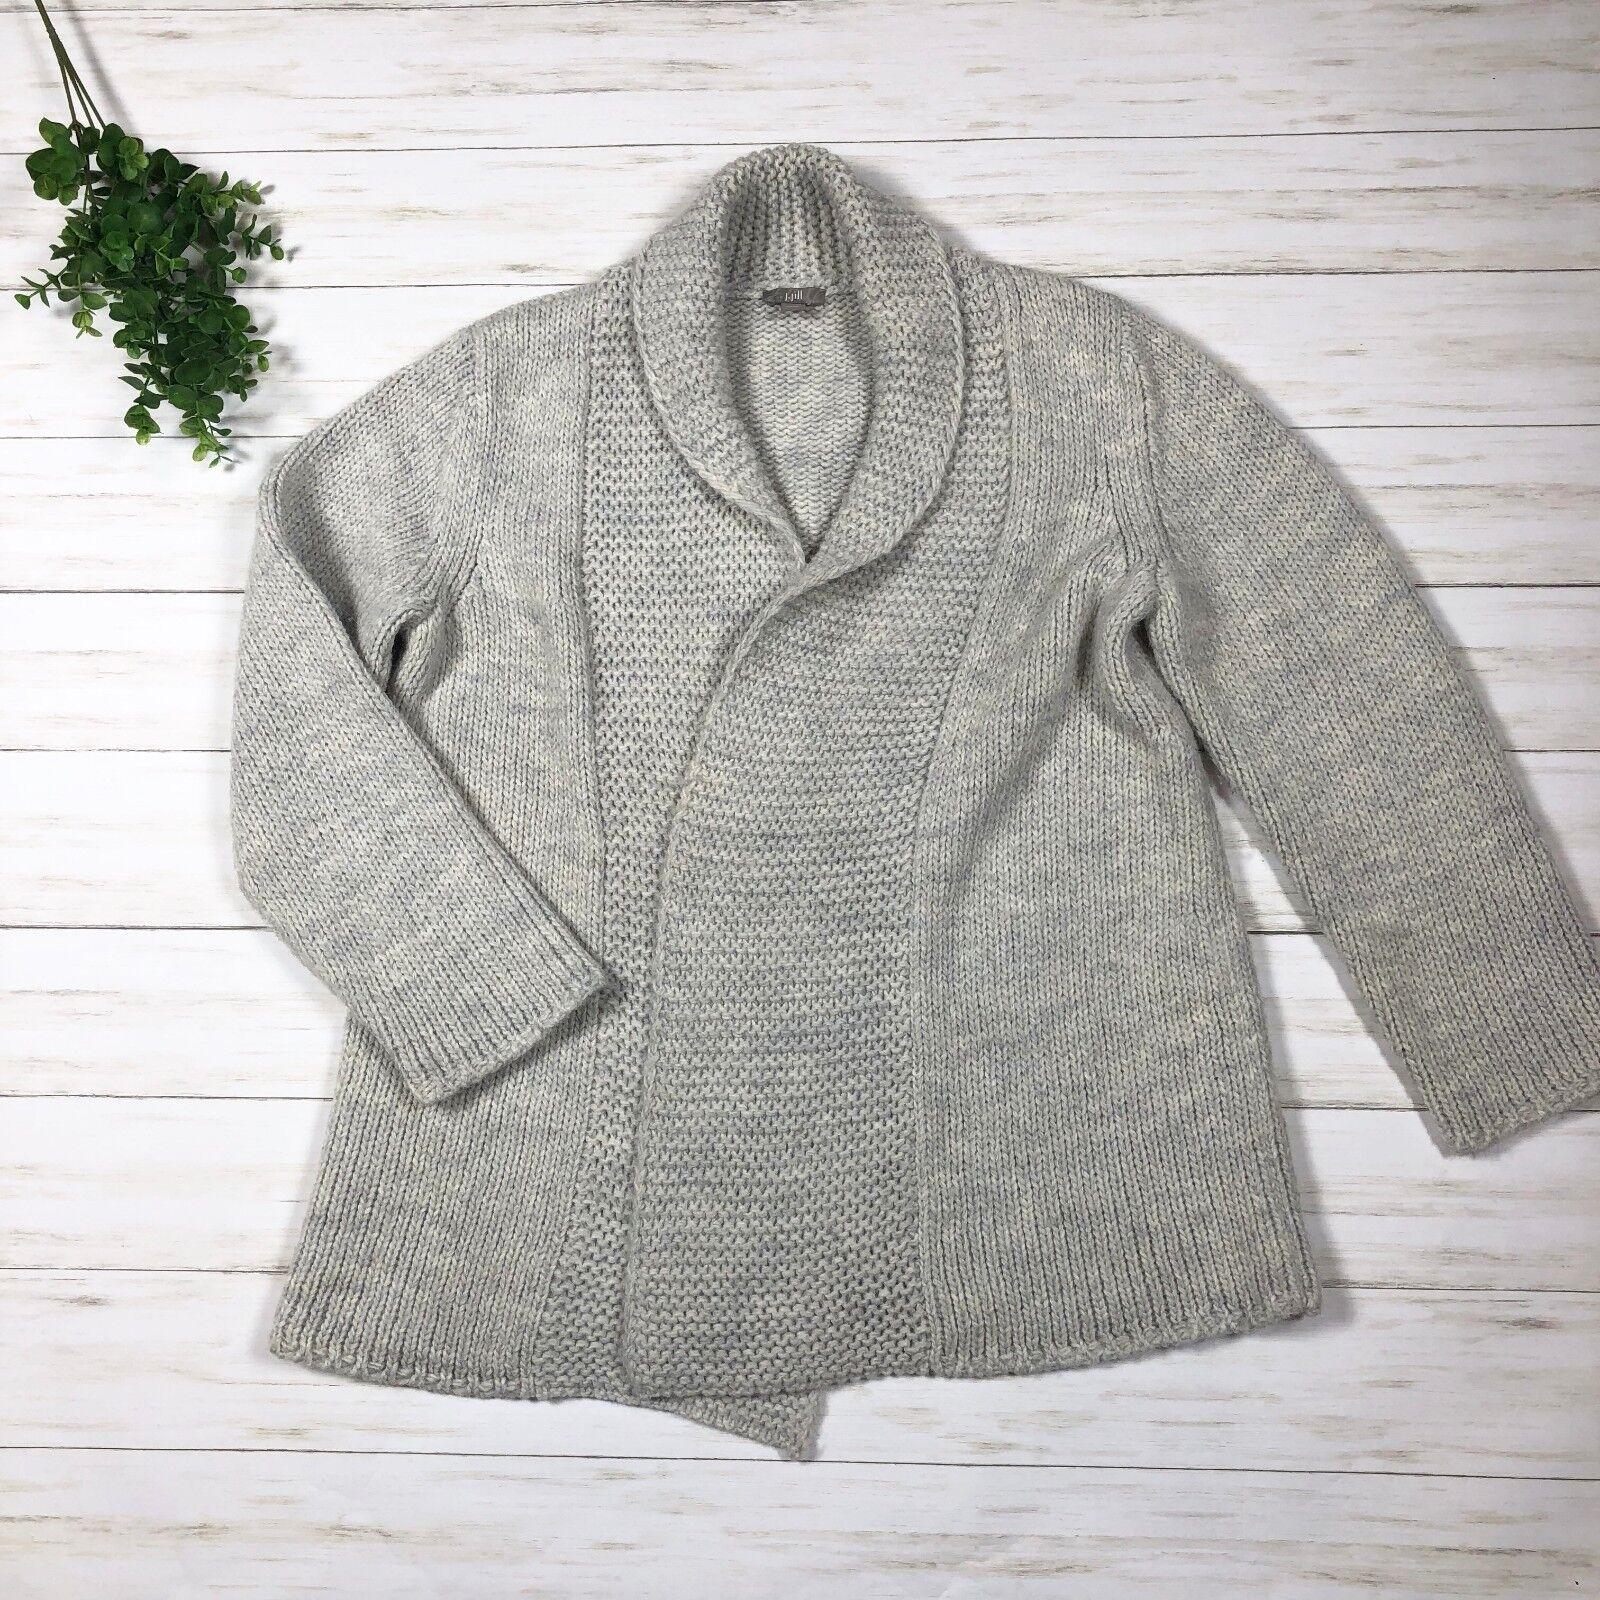 J. Jill Petite Alpaca Blend Blend Blend Sweater Cardigan sz M comfy knit light grey chunky a34a17